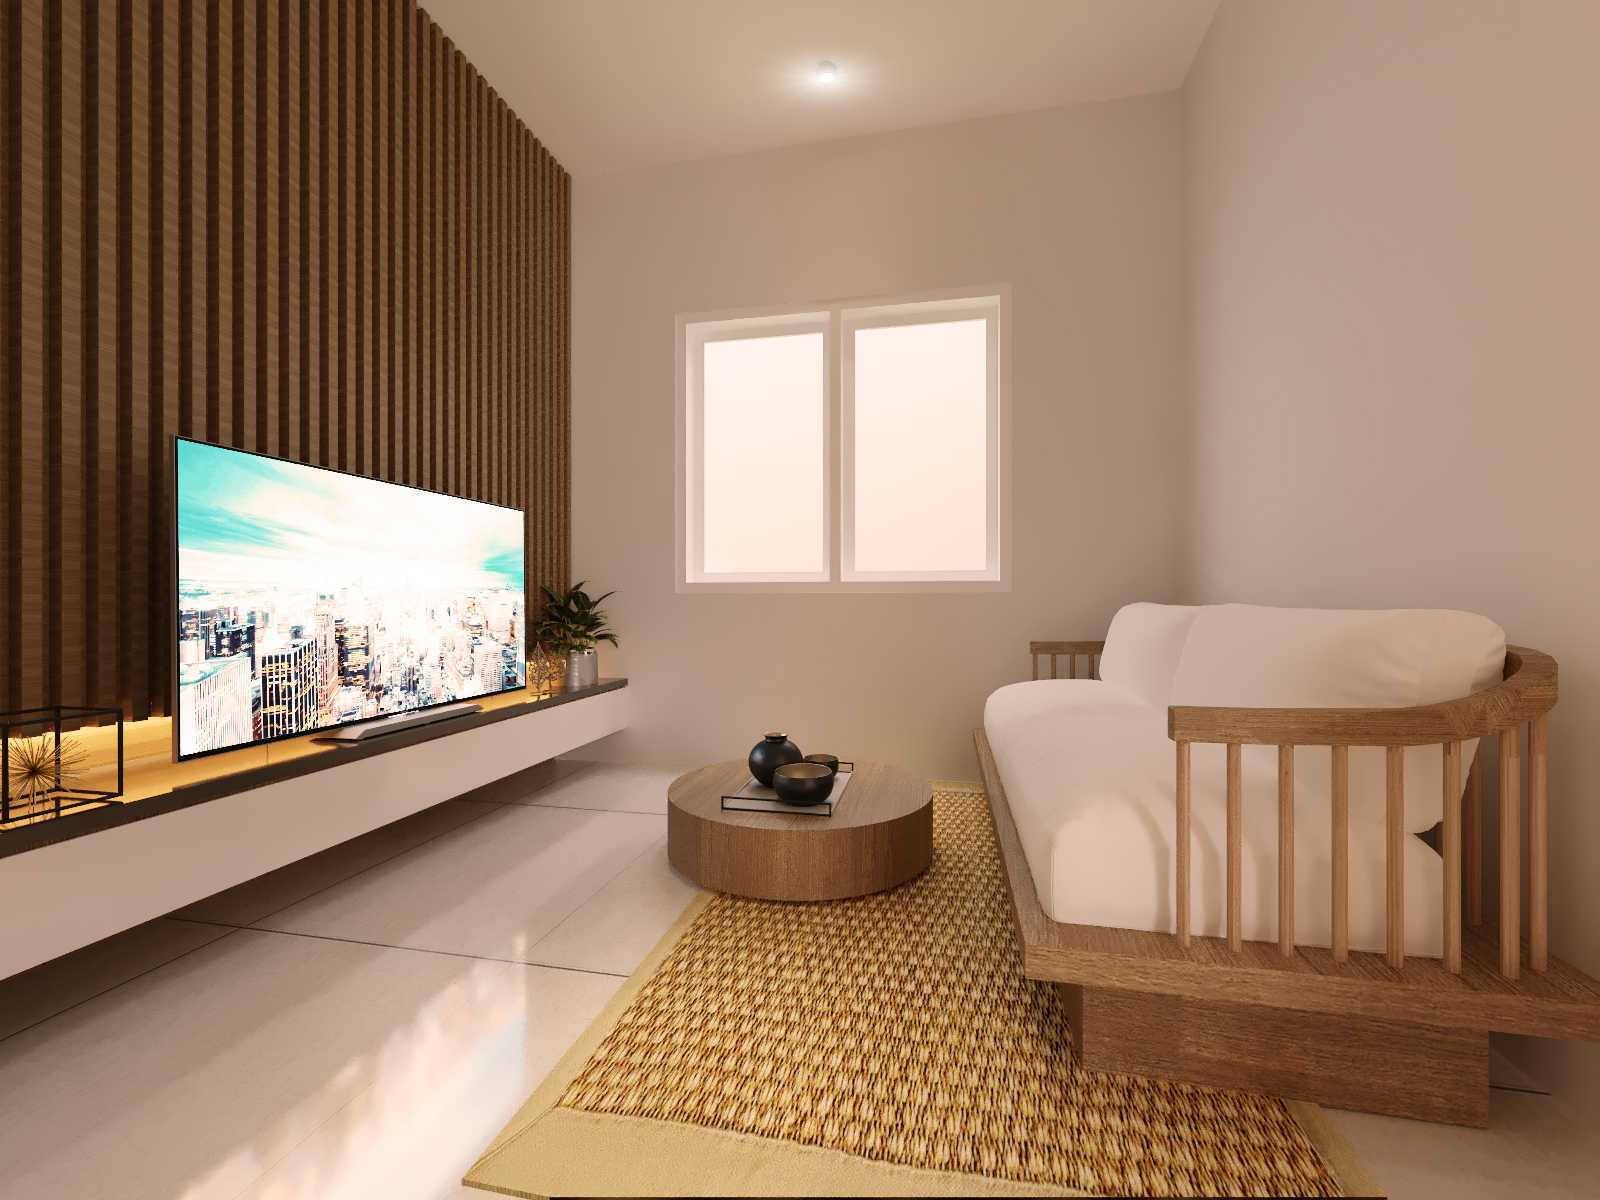 Mitrasasana - Design & Build Yg House Bekasi, Kota Bks, Jawa Barat, Indonesia Bekasi, Kota Bks, Jawa Barat, Indonesia Mitrasasana-Design-Build-Yg-House  78699